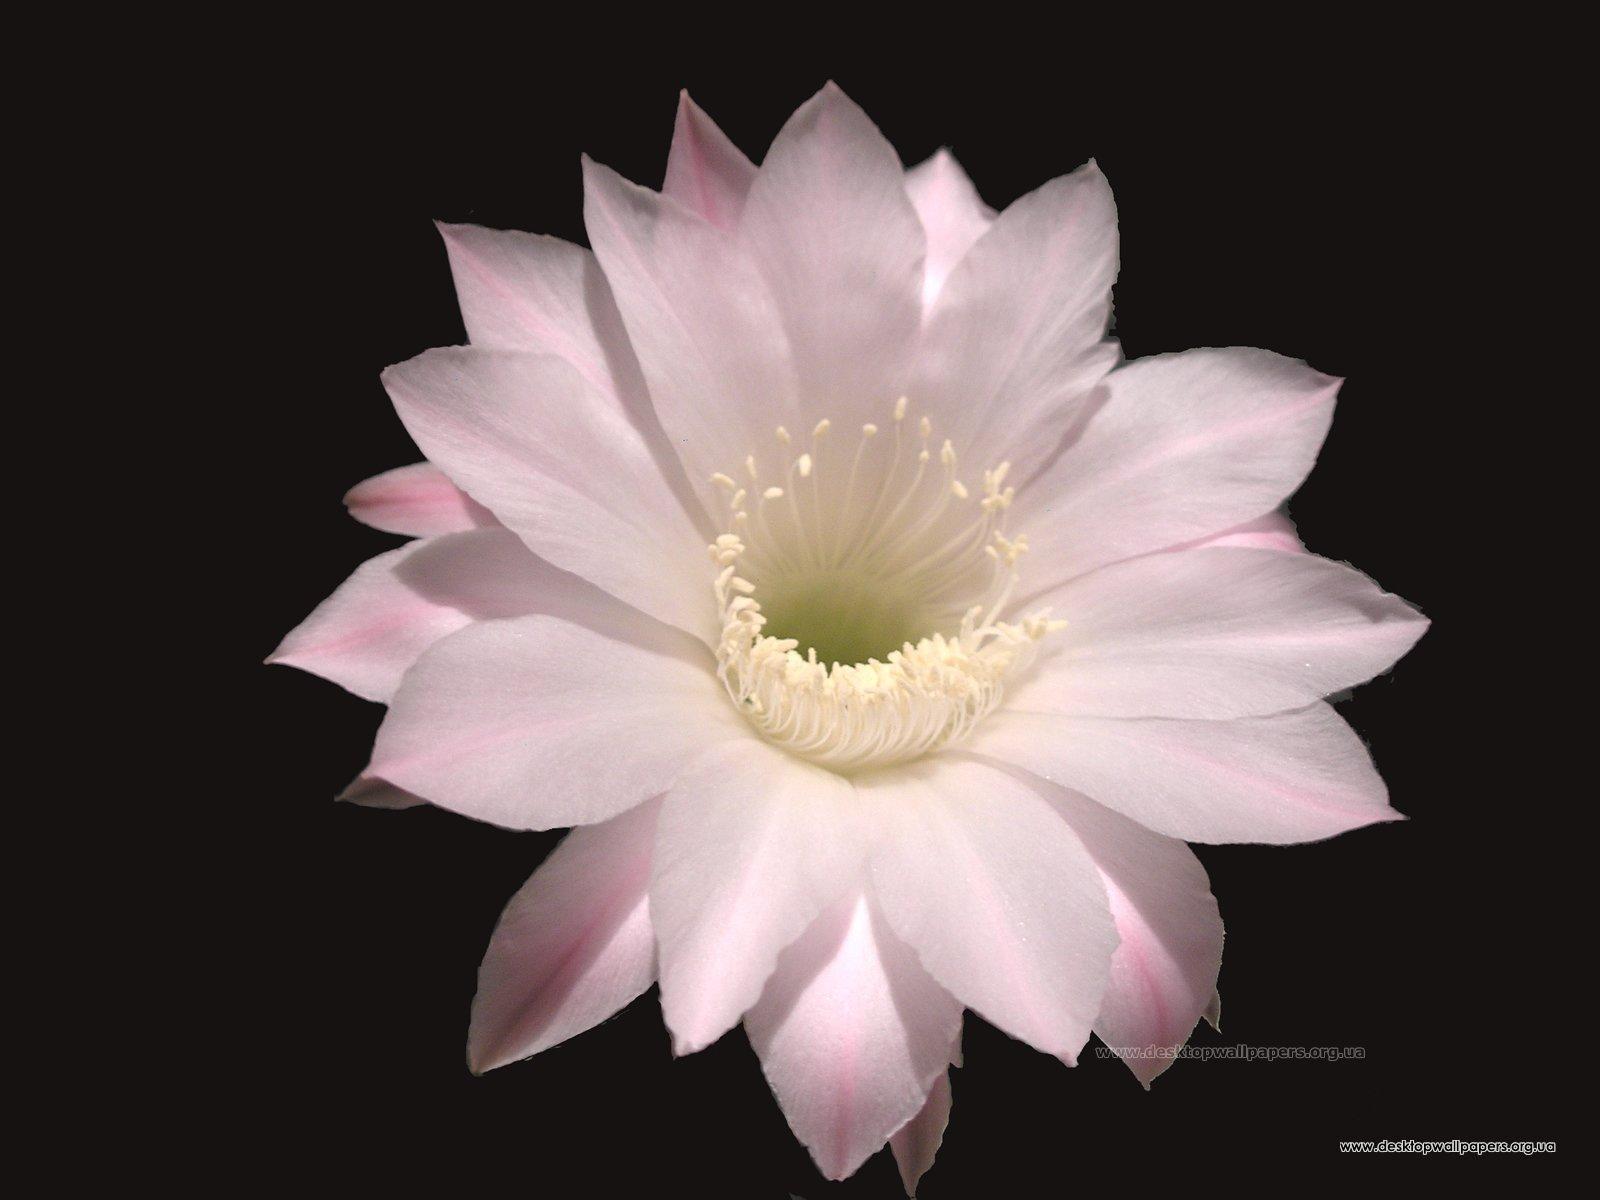 Фото цветы кактусы, бесплатные фото ...: pictures11.ru/foto-cvety-kaktusy.html